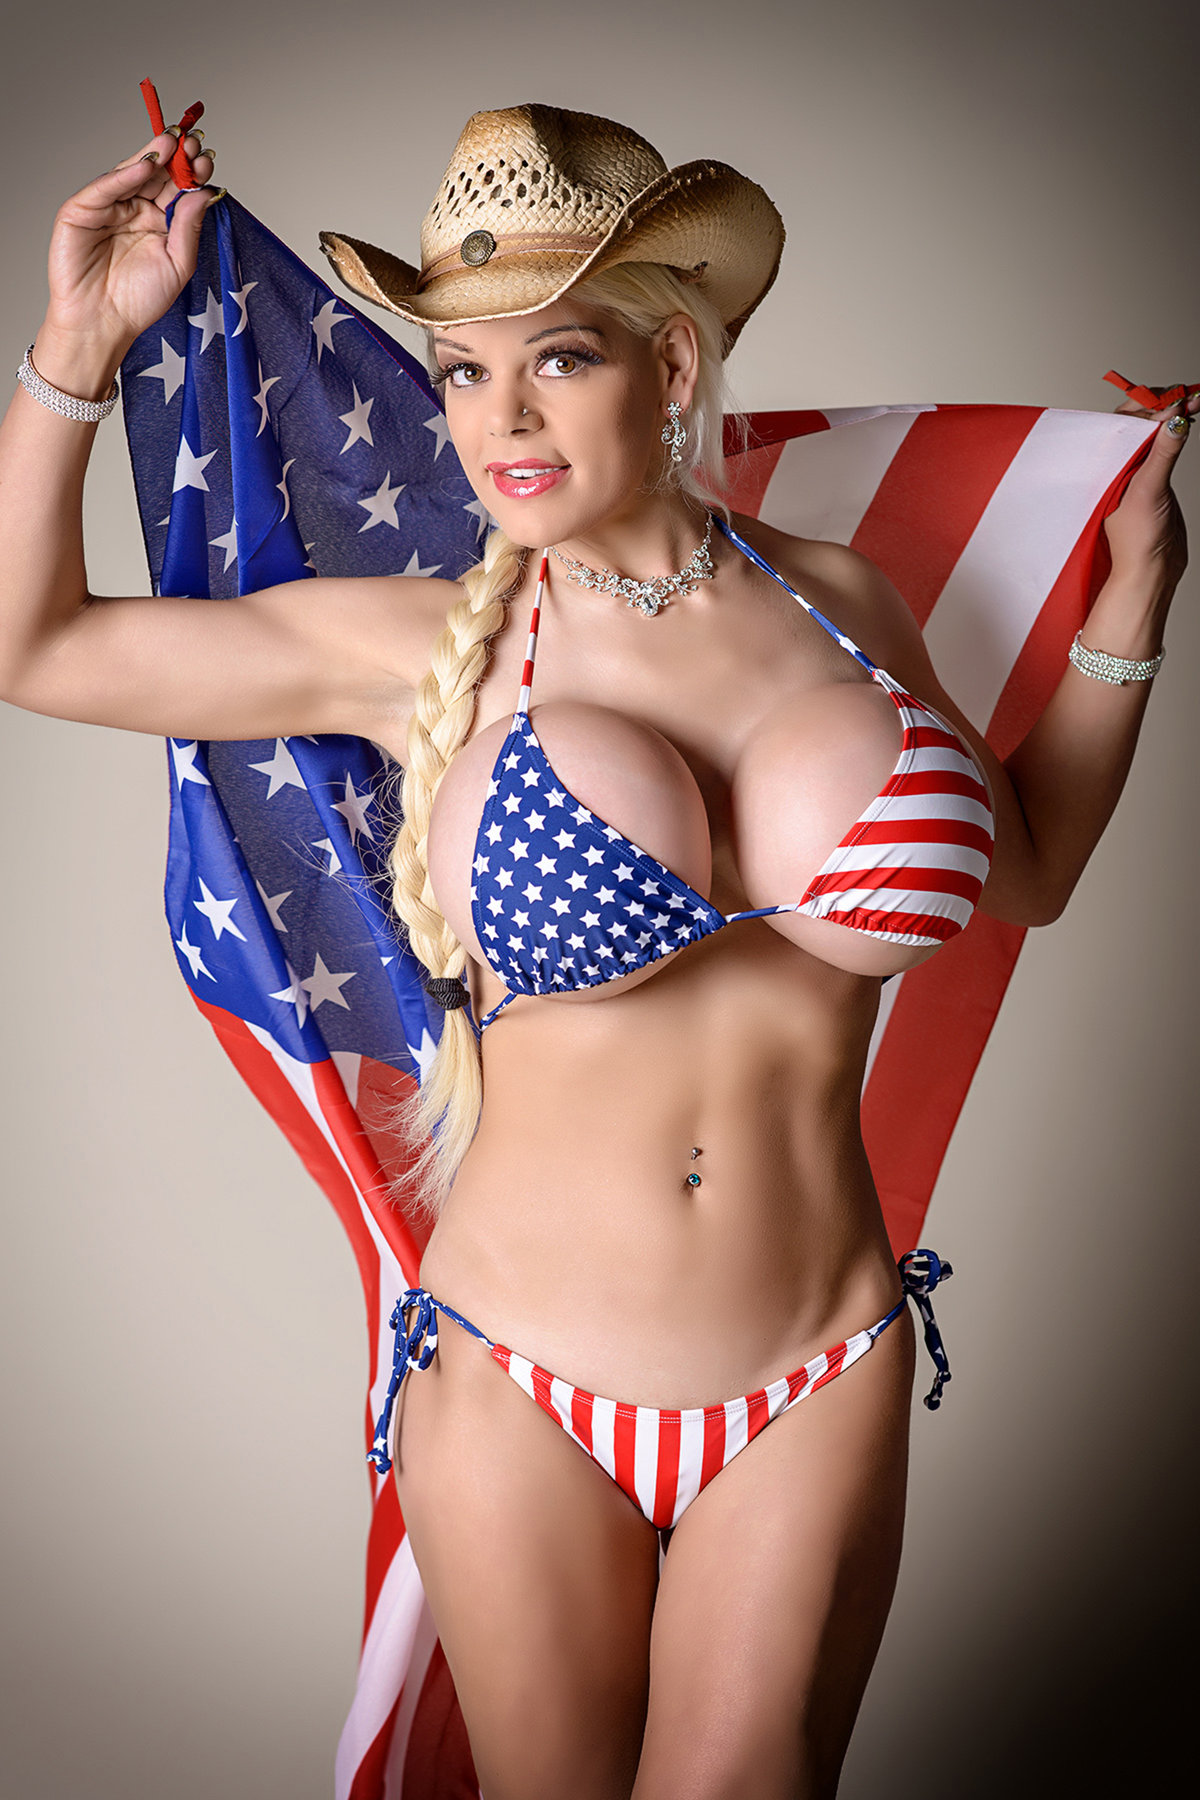 Noida nude american girl boob